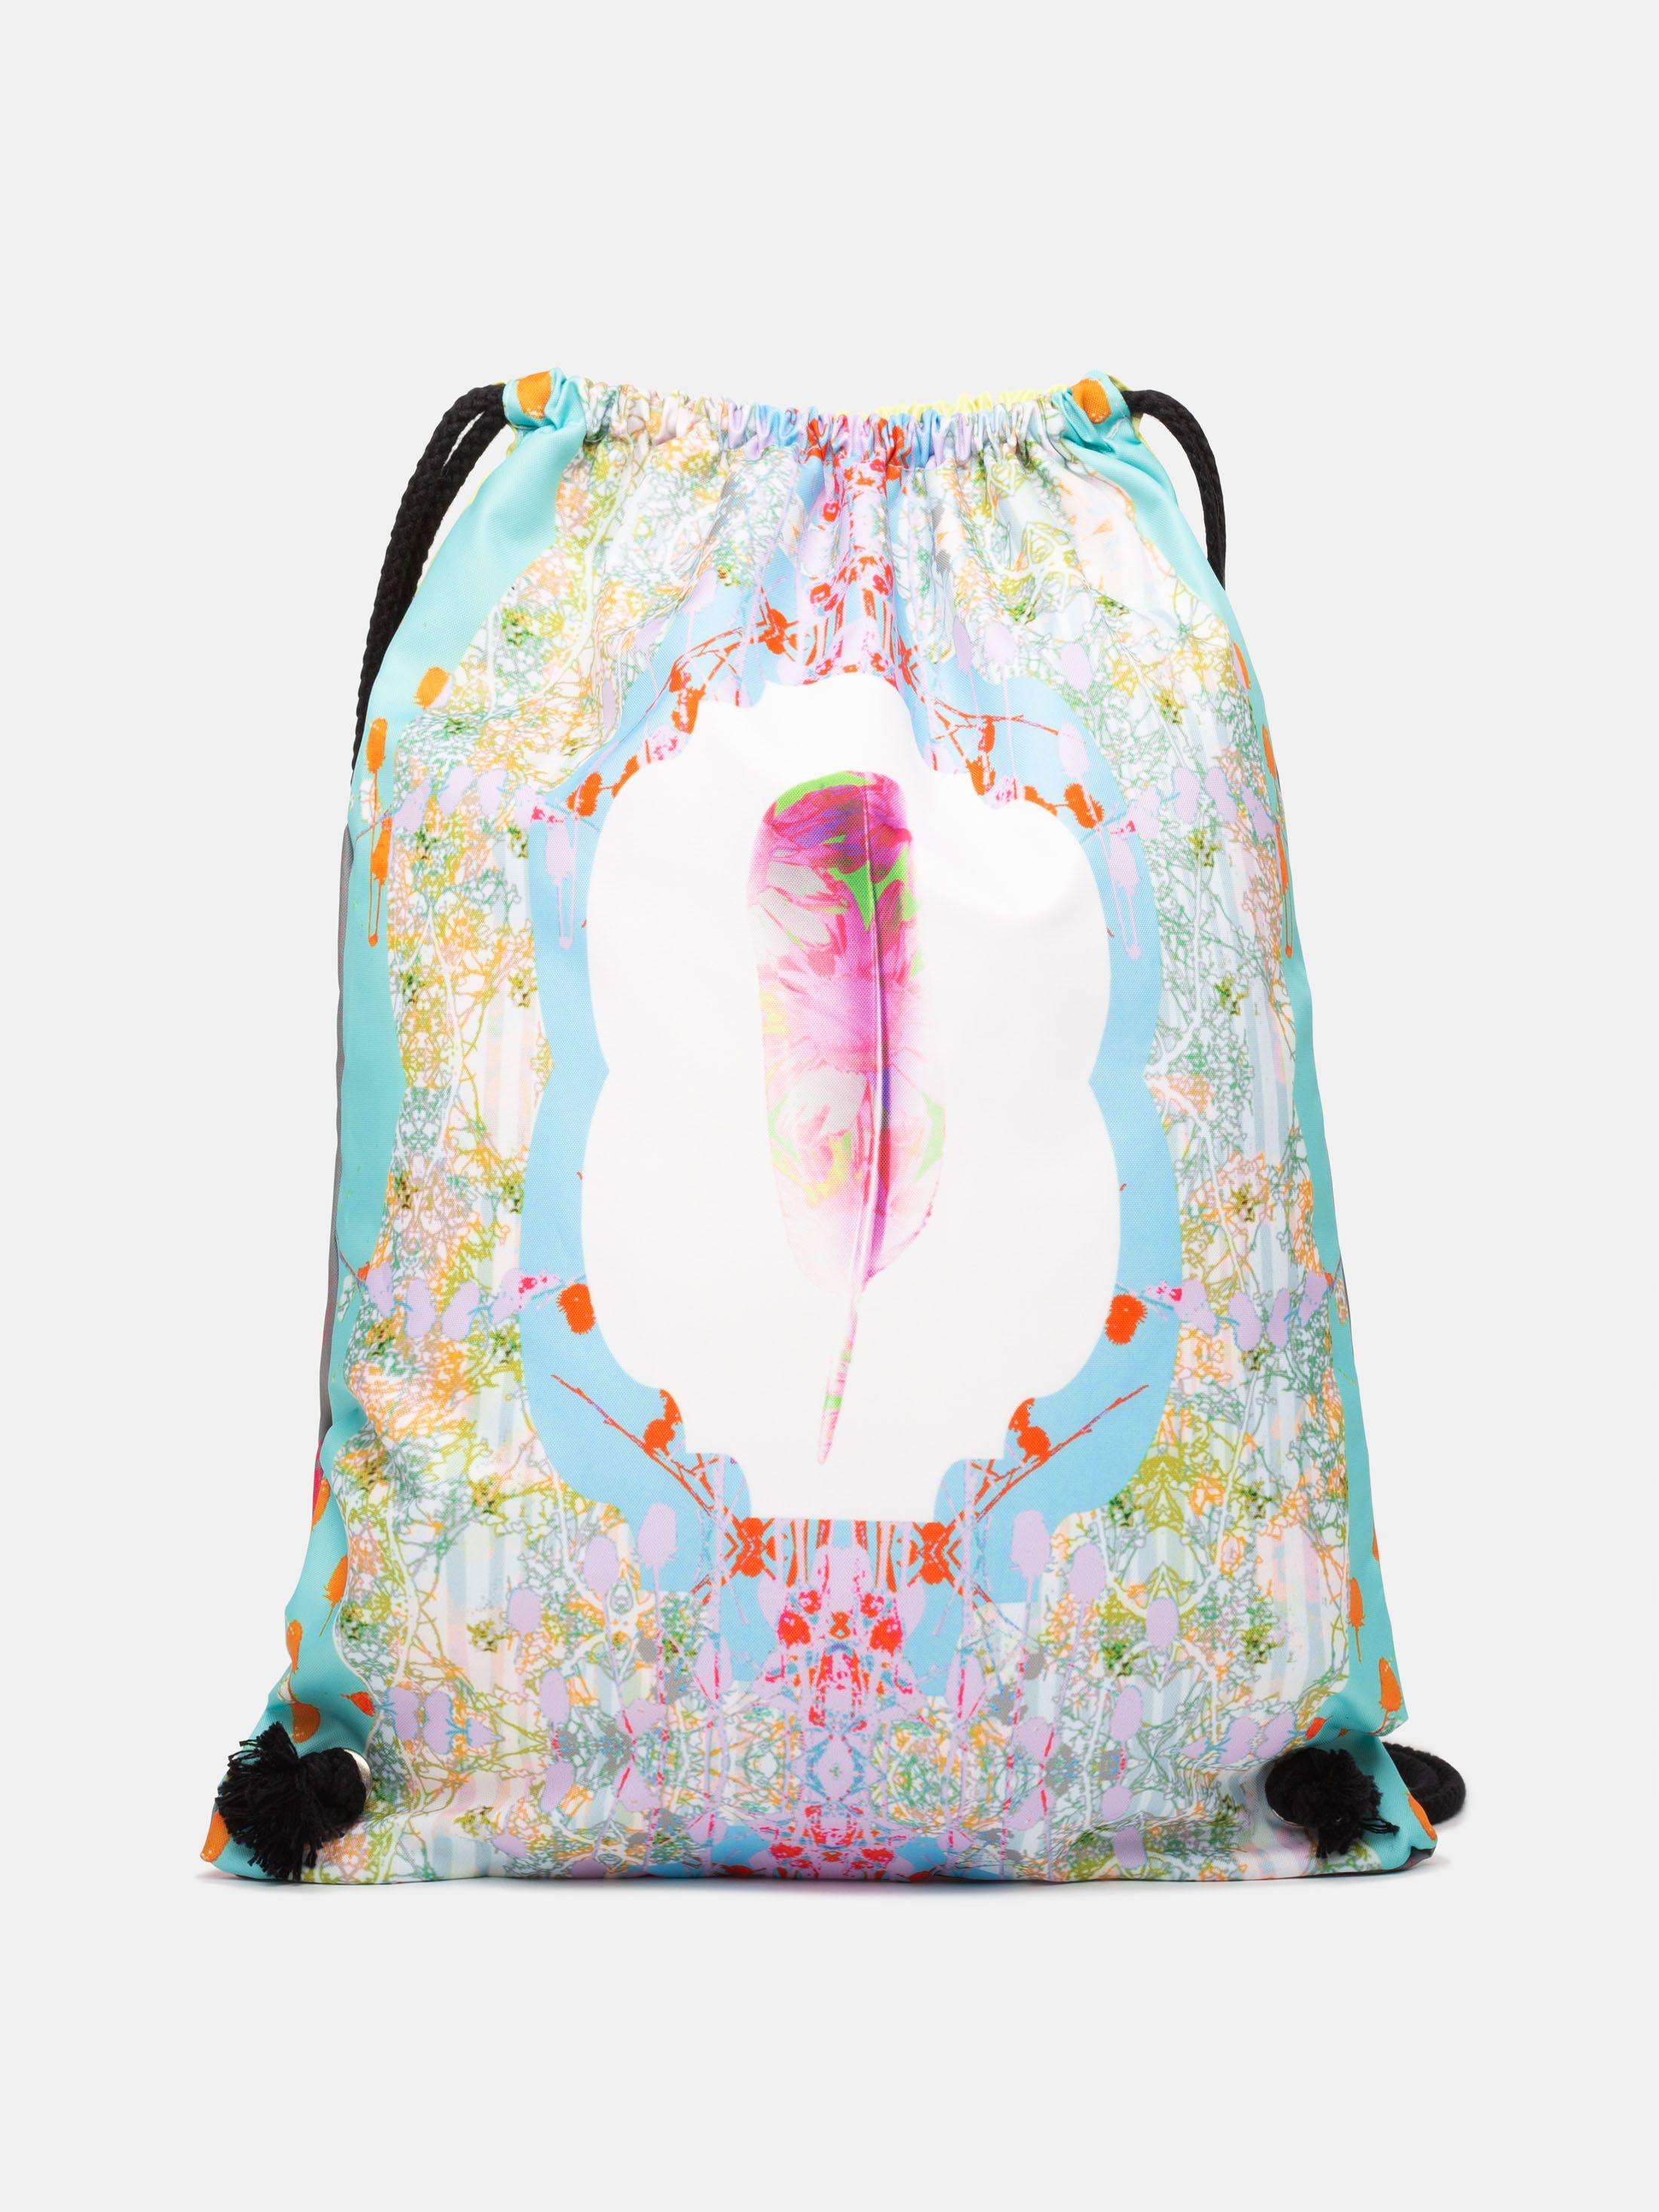 custom drawstring bags printed with pink floral design